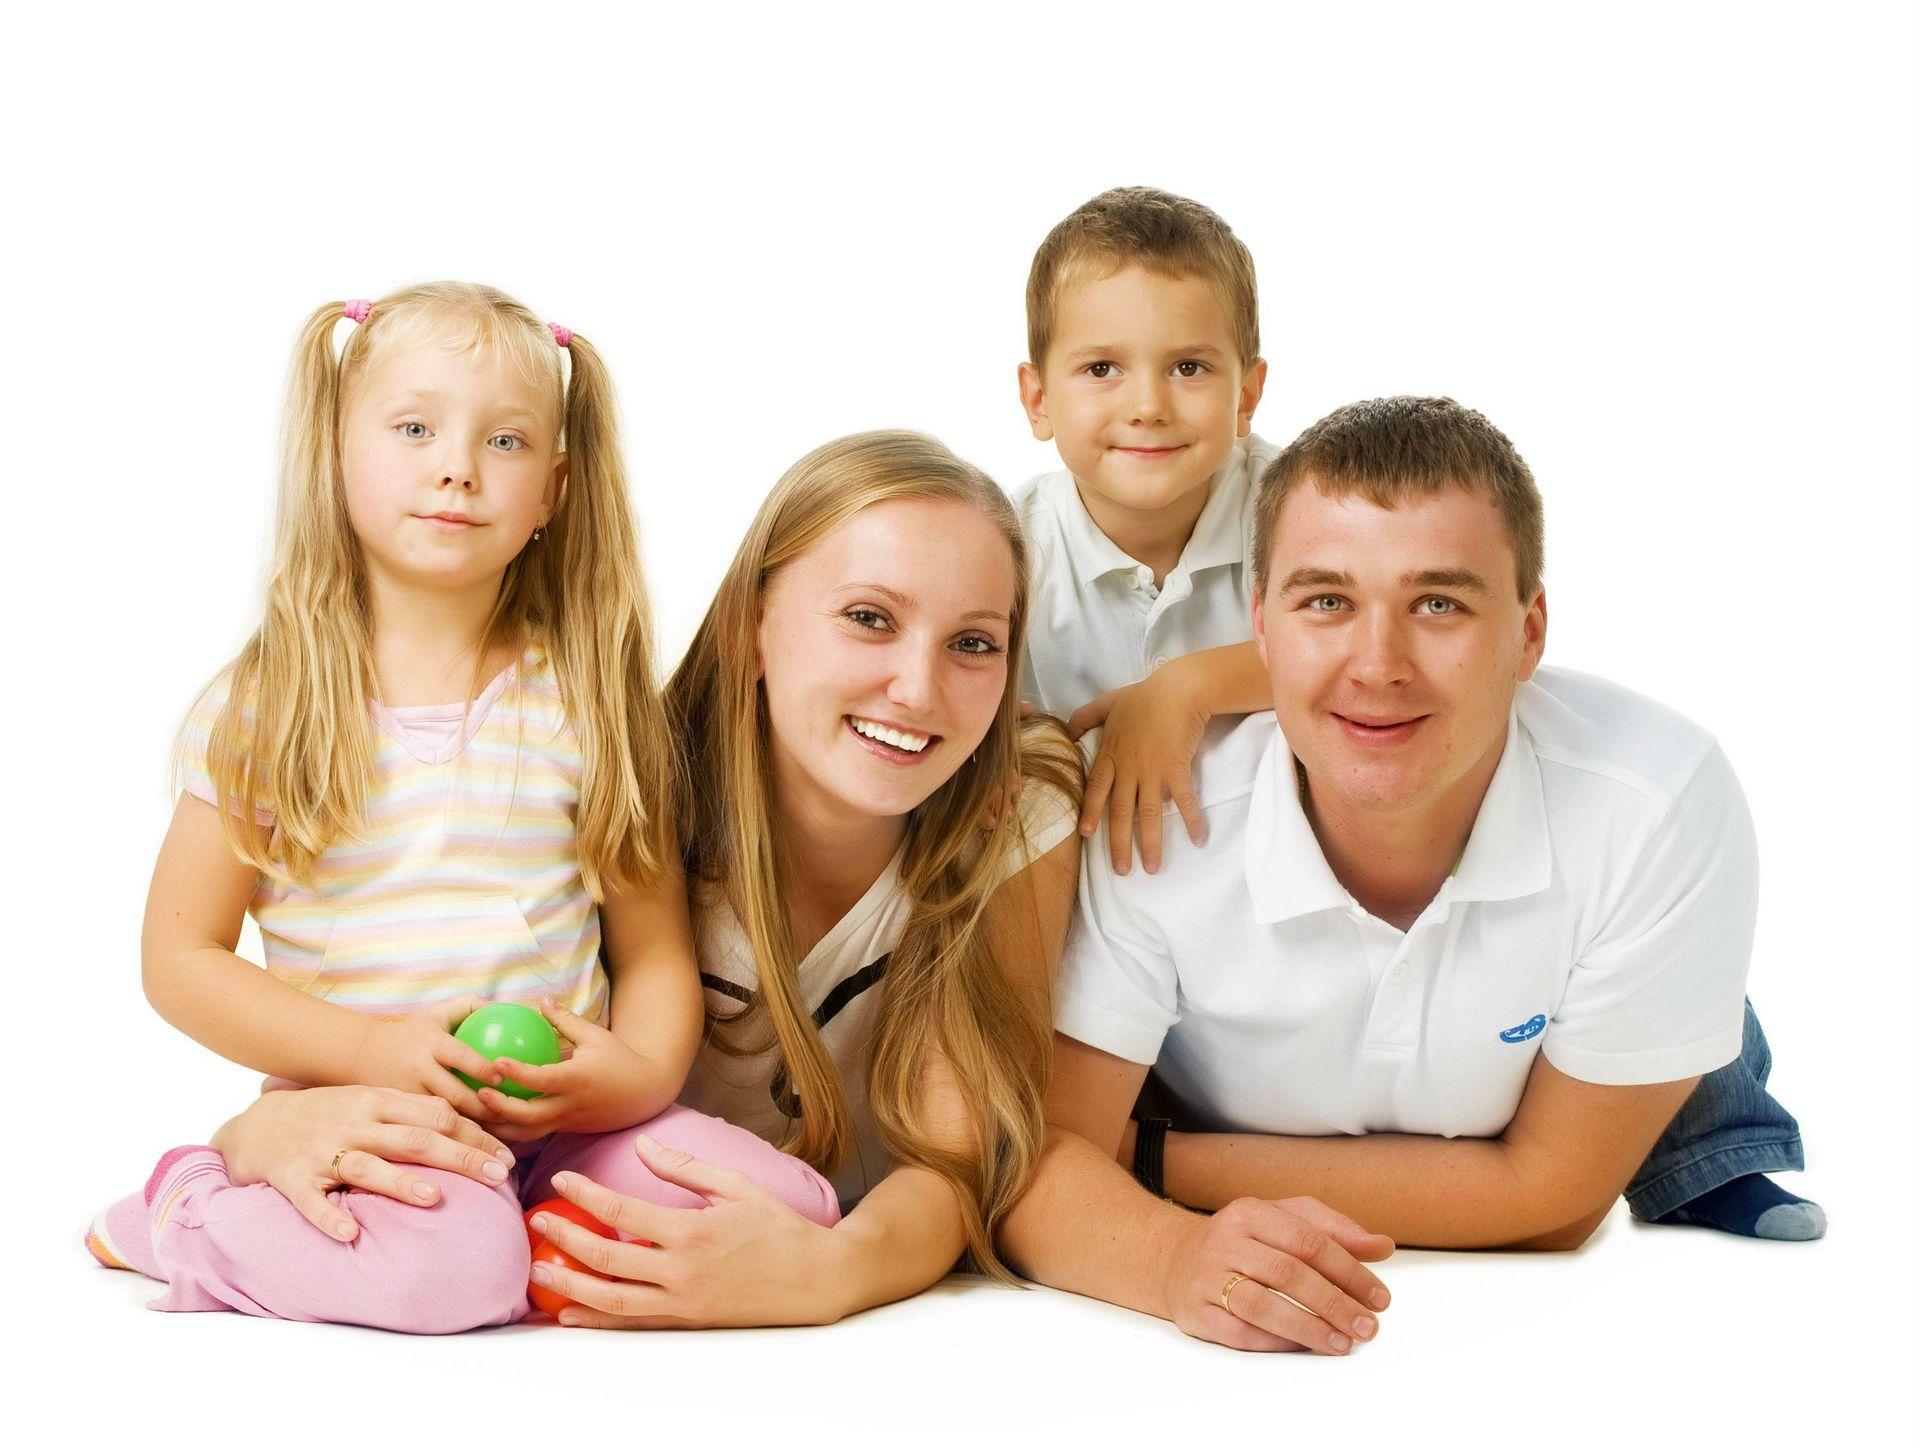 family-desktop-images-happy-family